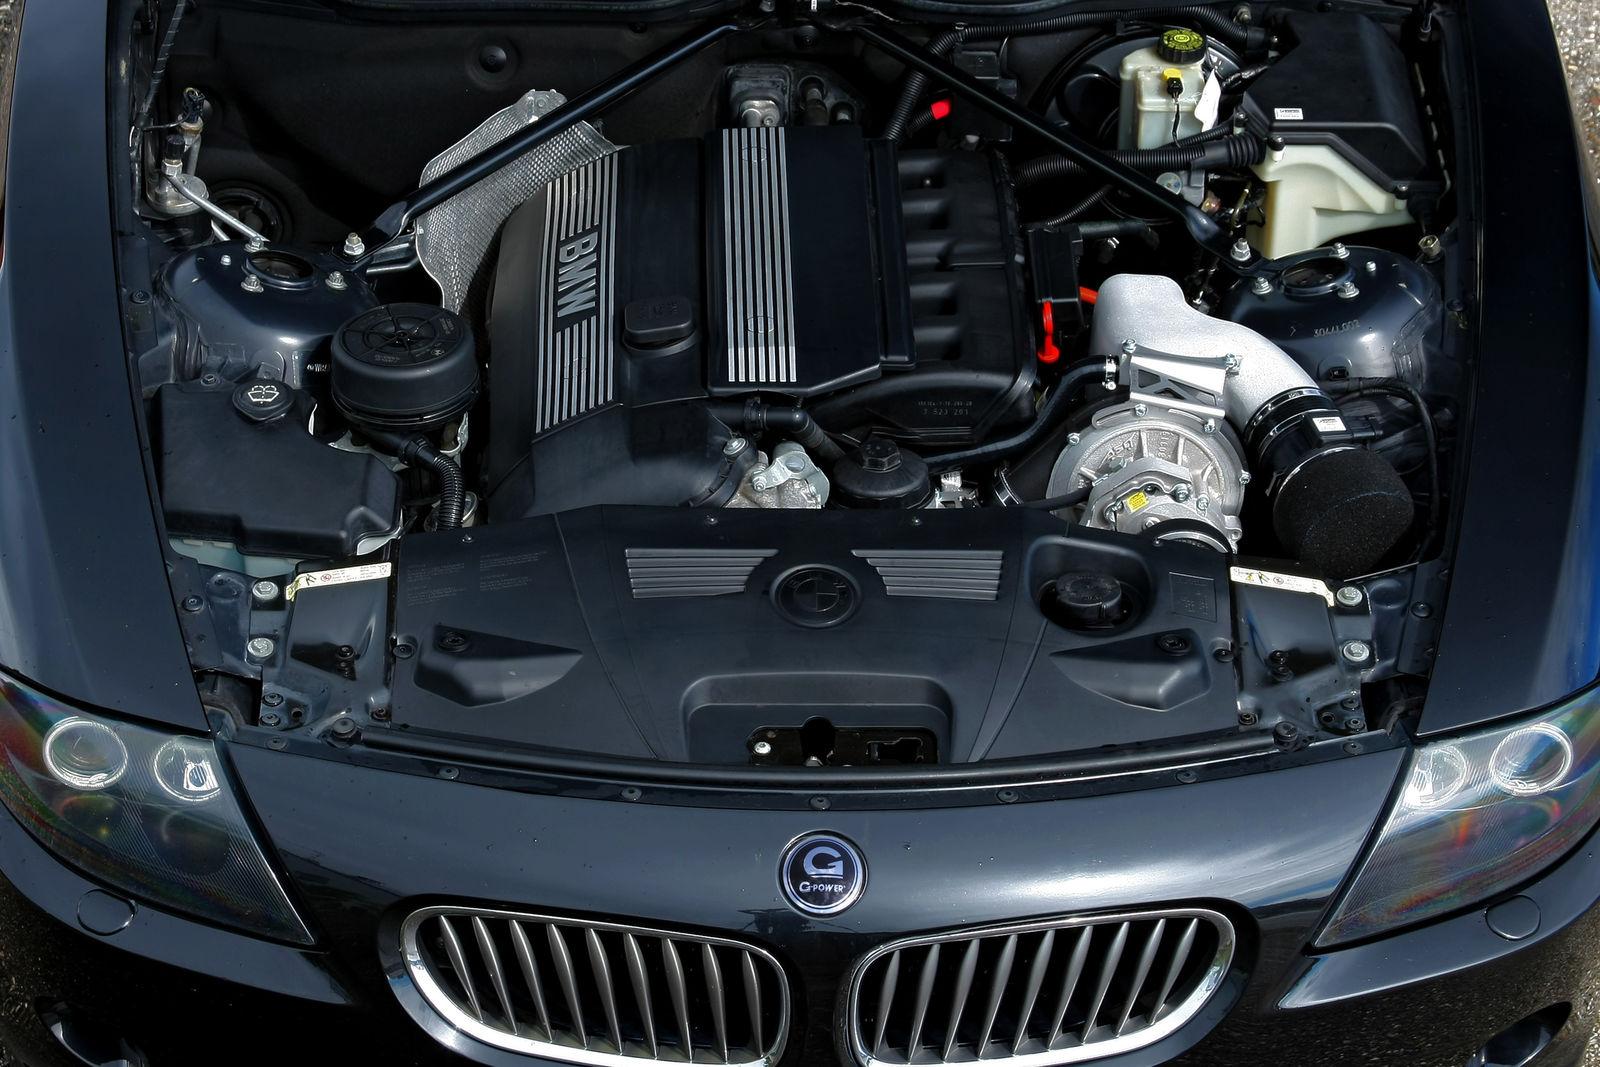 BMW_E46_330_Z4_01